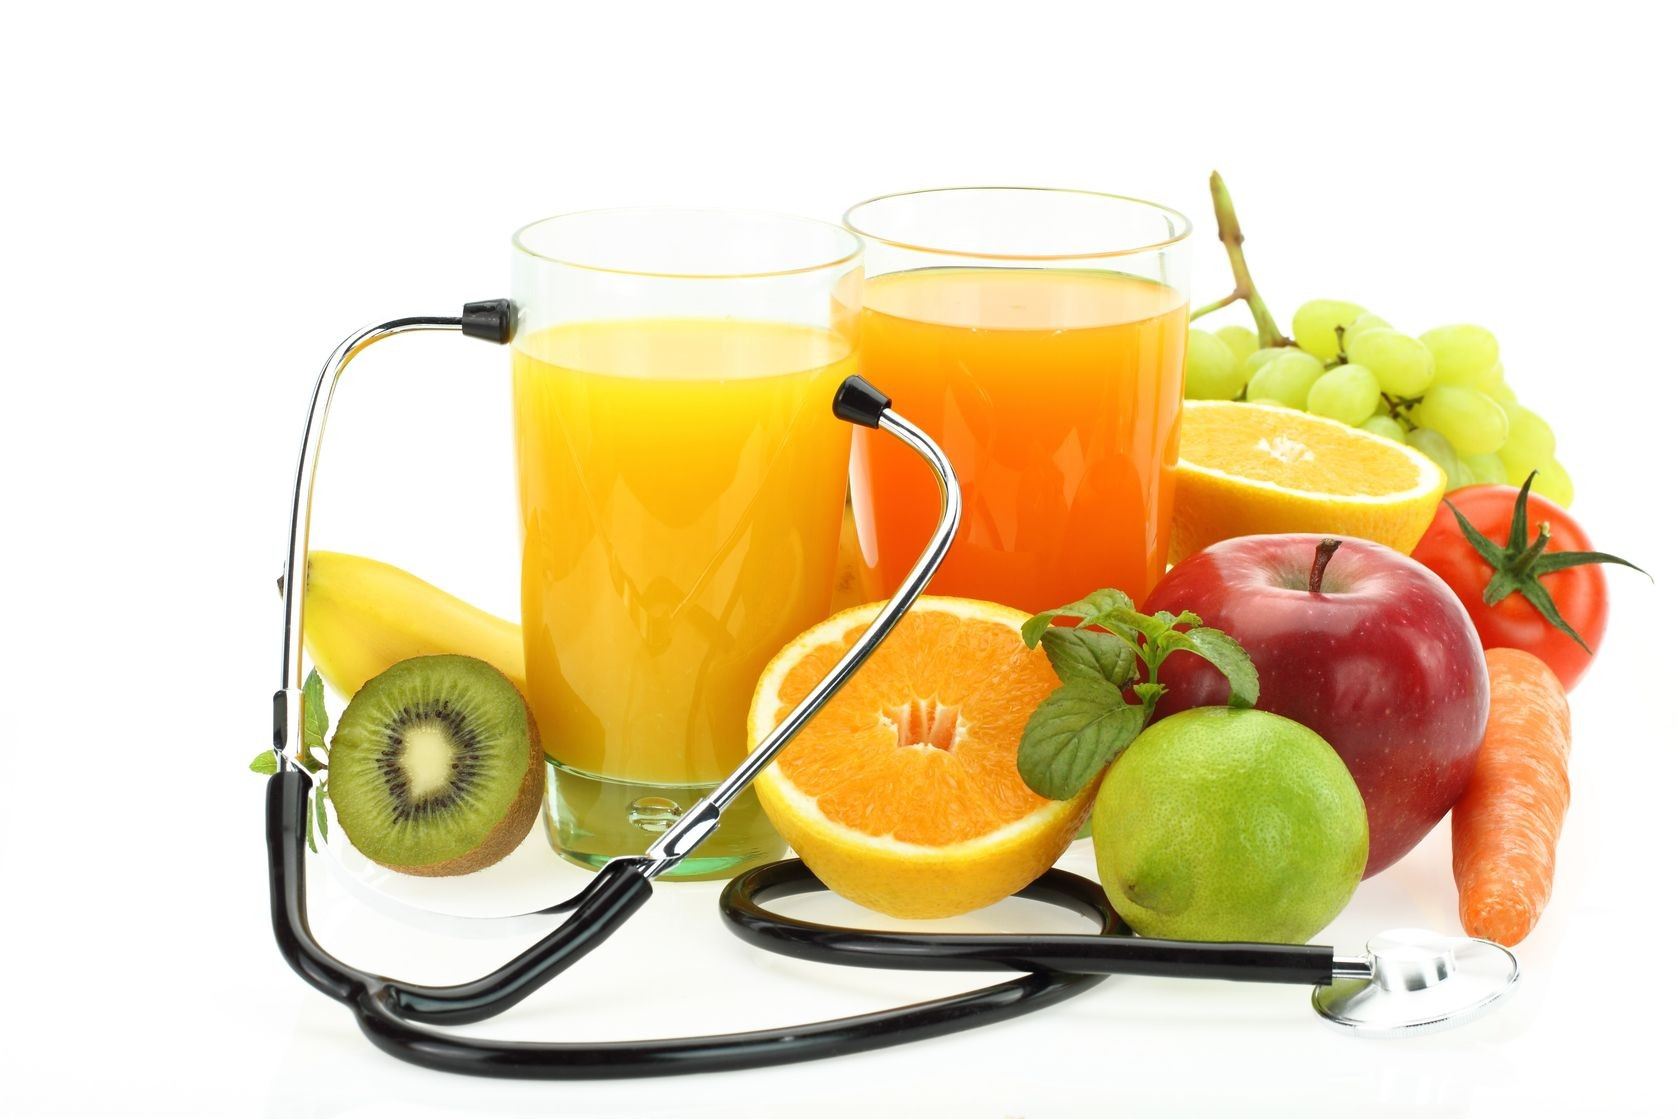 cholesterol-diabete-hypertension-chaque-maladie-son-regime.jpg